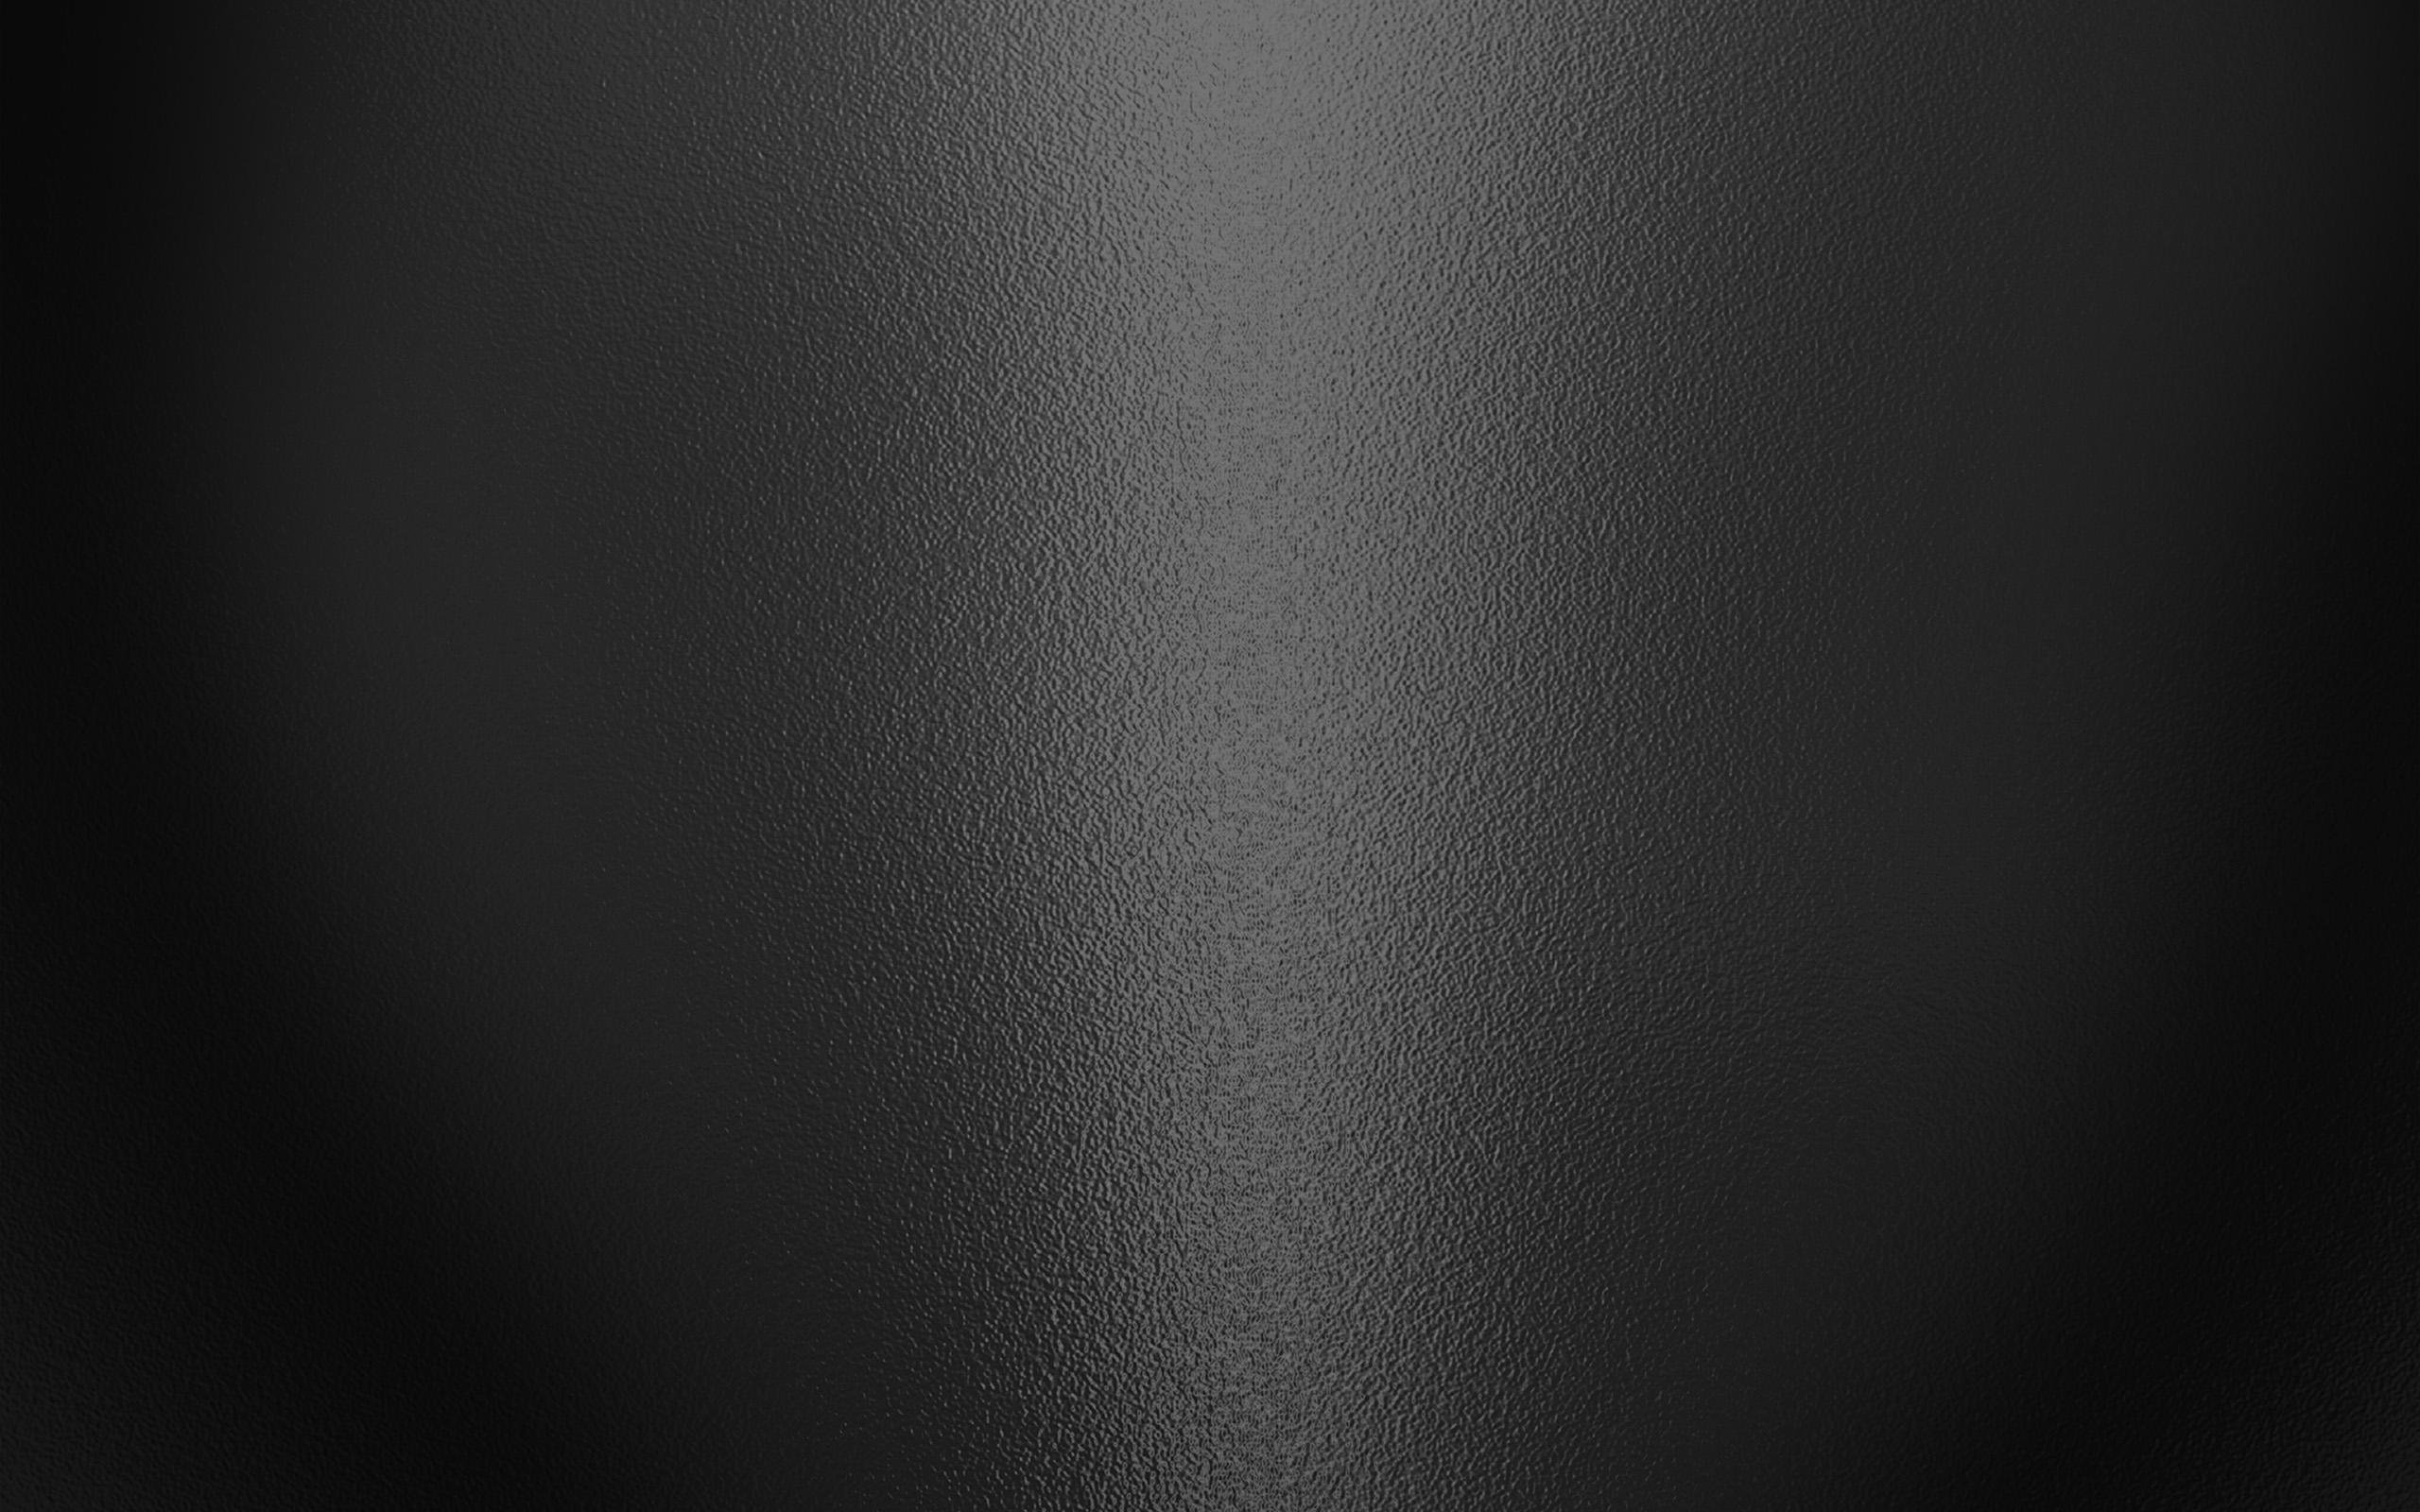 Black And Gold Textured Wallpaper Wallpaper For Desktop Laptop Vr46 Texture Dark Black